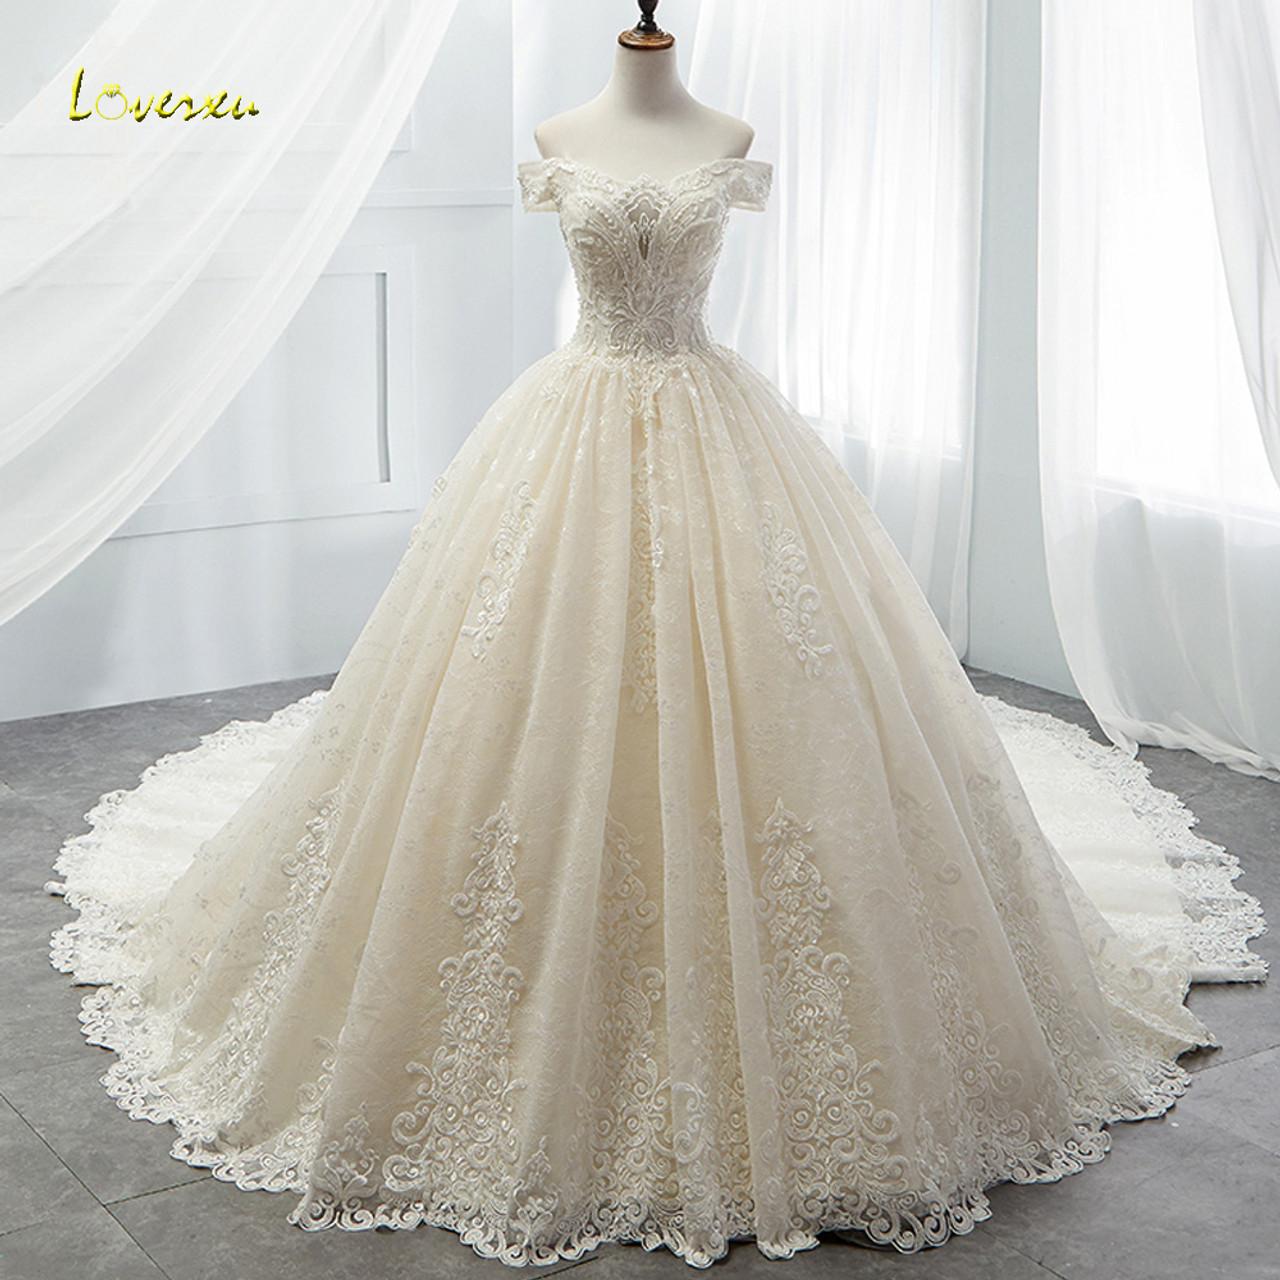 31d5f9f39164b Loverxu Boat Neck Lace Vintage Ball Gown Wedding Dress 2018 Royal Train  Appliques Beaded Princess Bridal Gown Vestido De Noiva